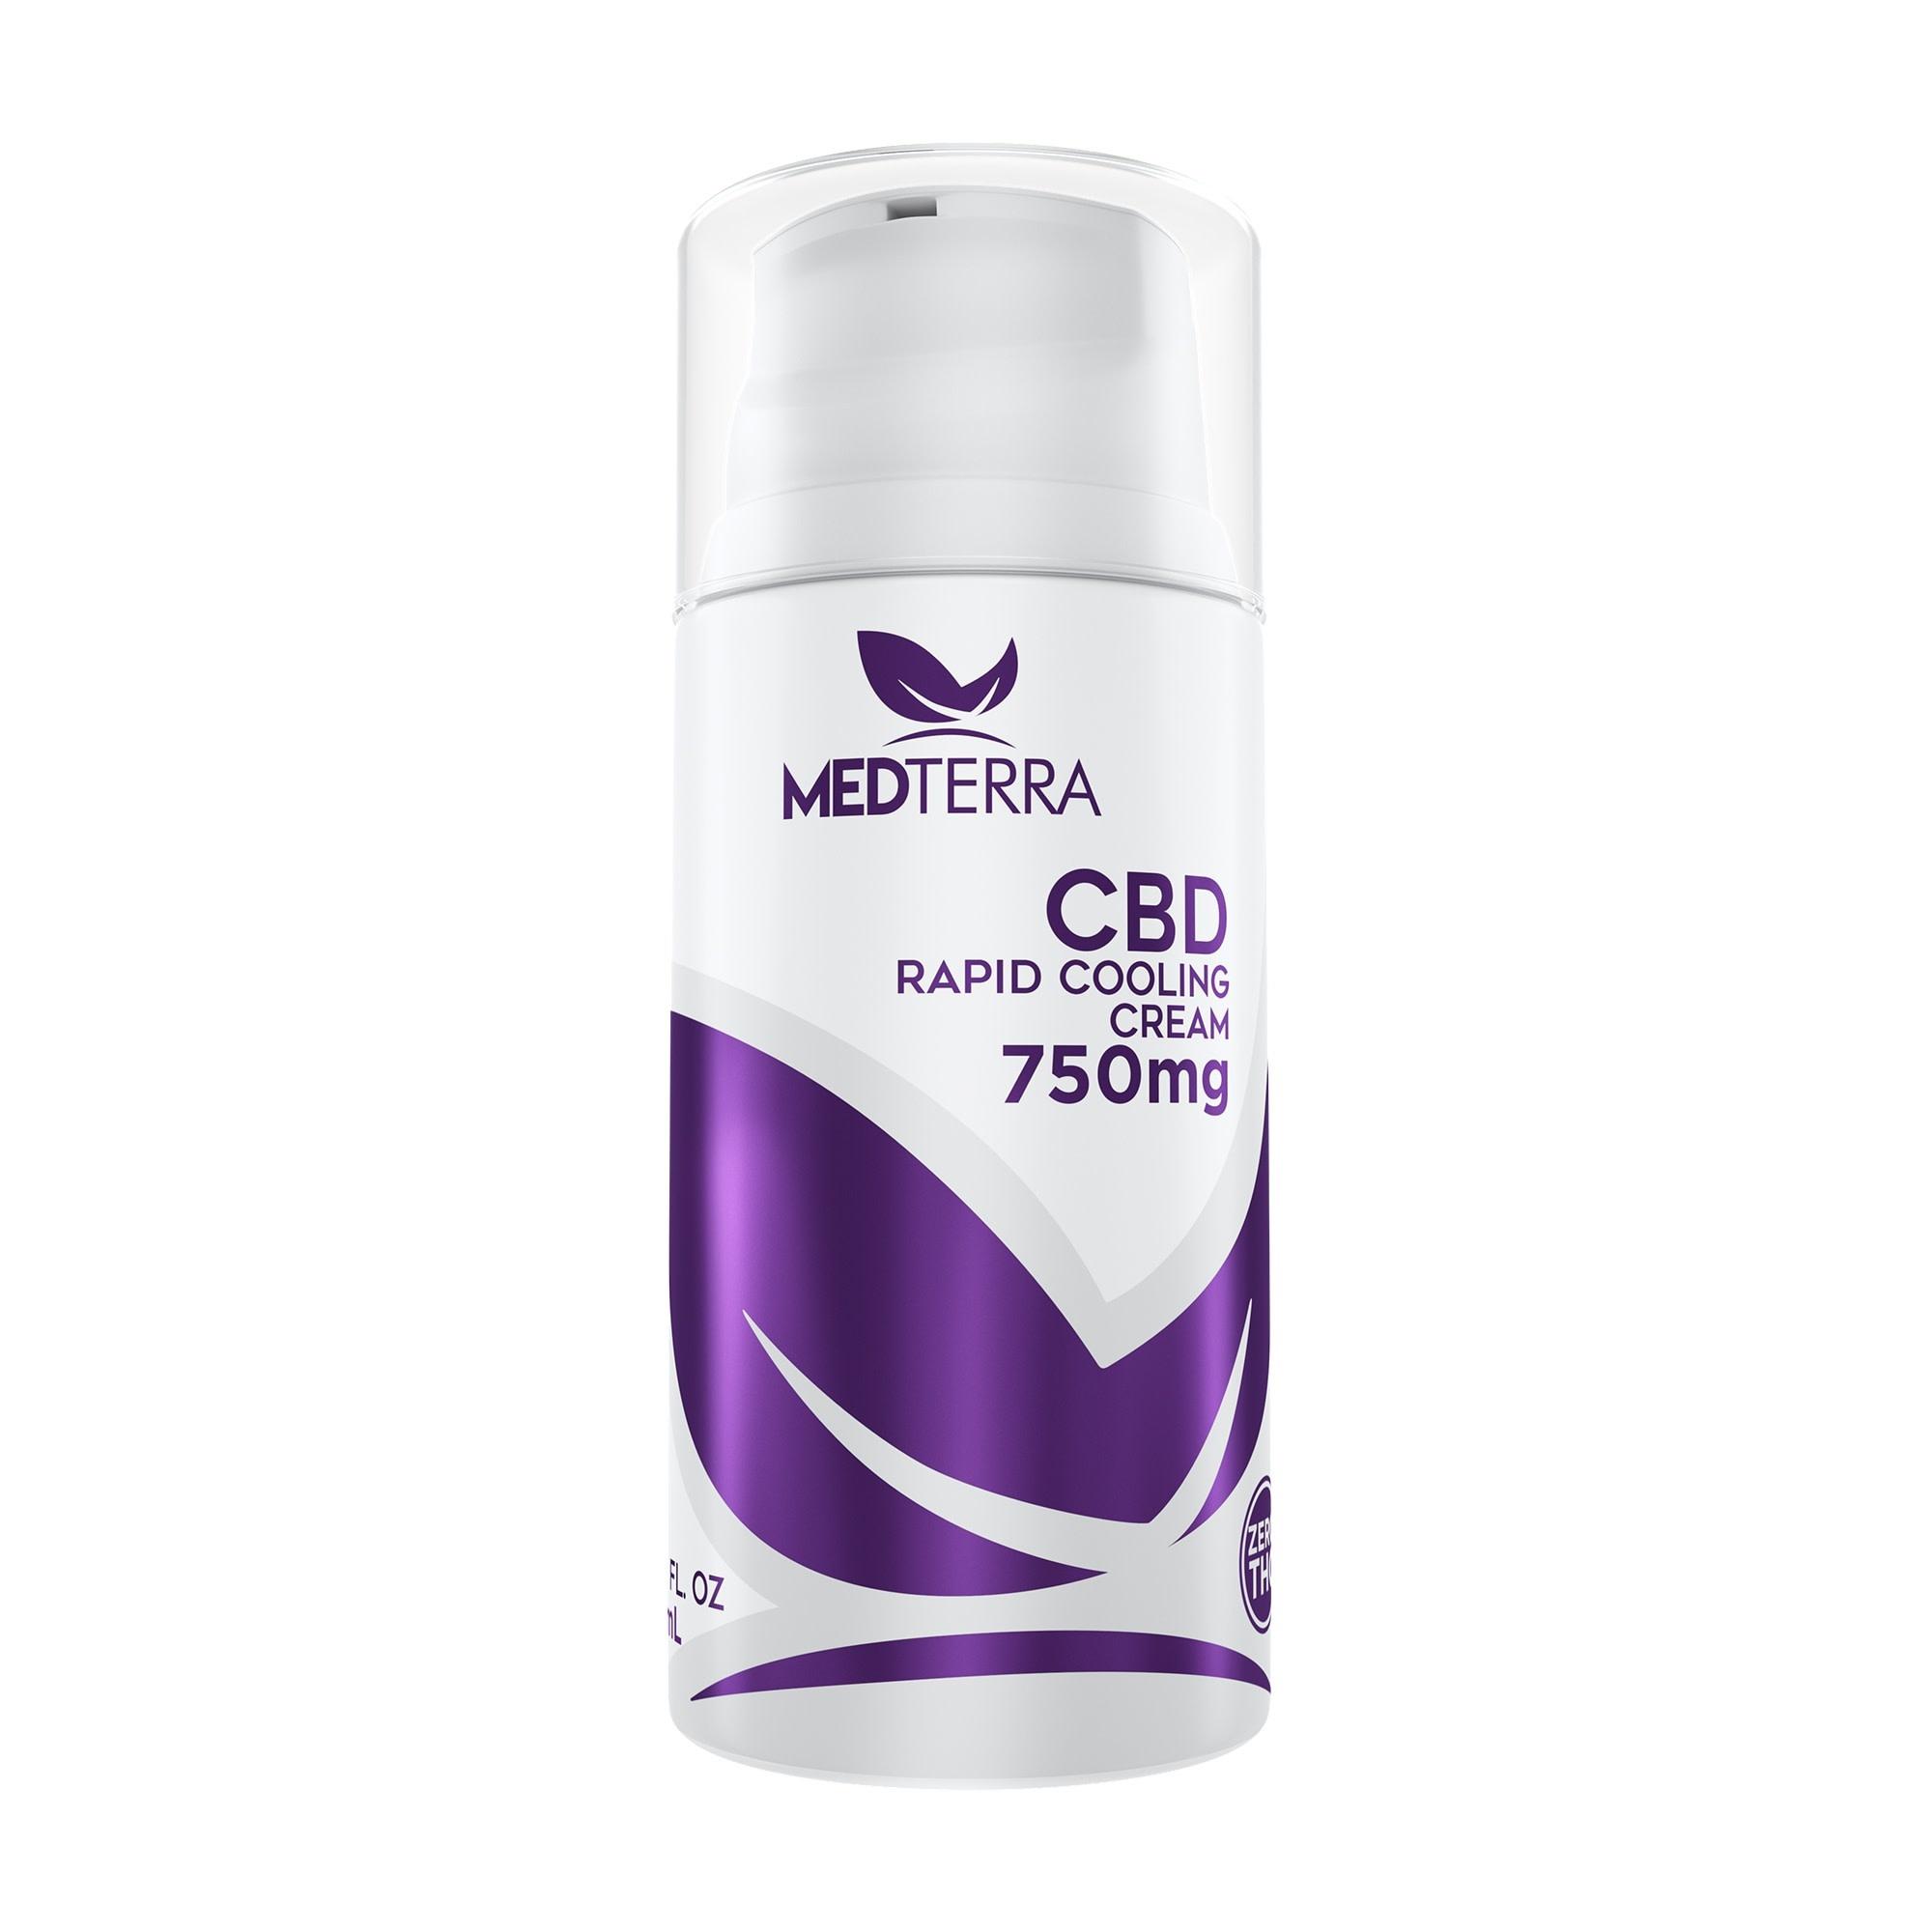 MedTerra CBD Topical Cooling Cream, 750mg